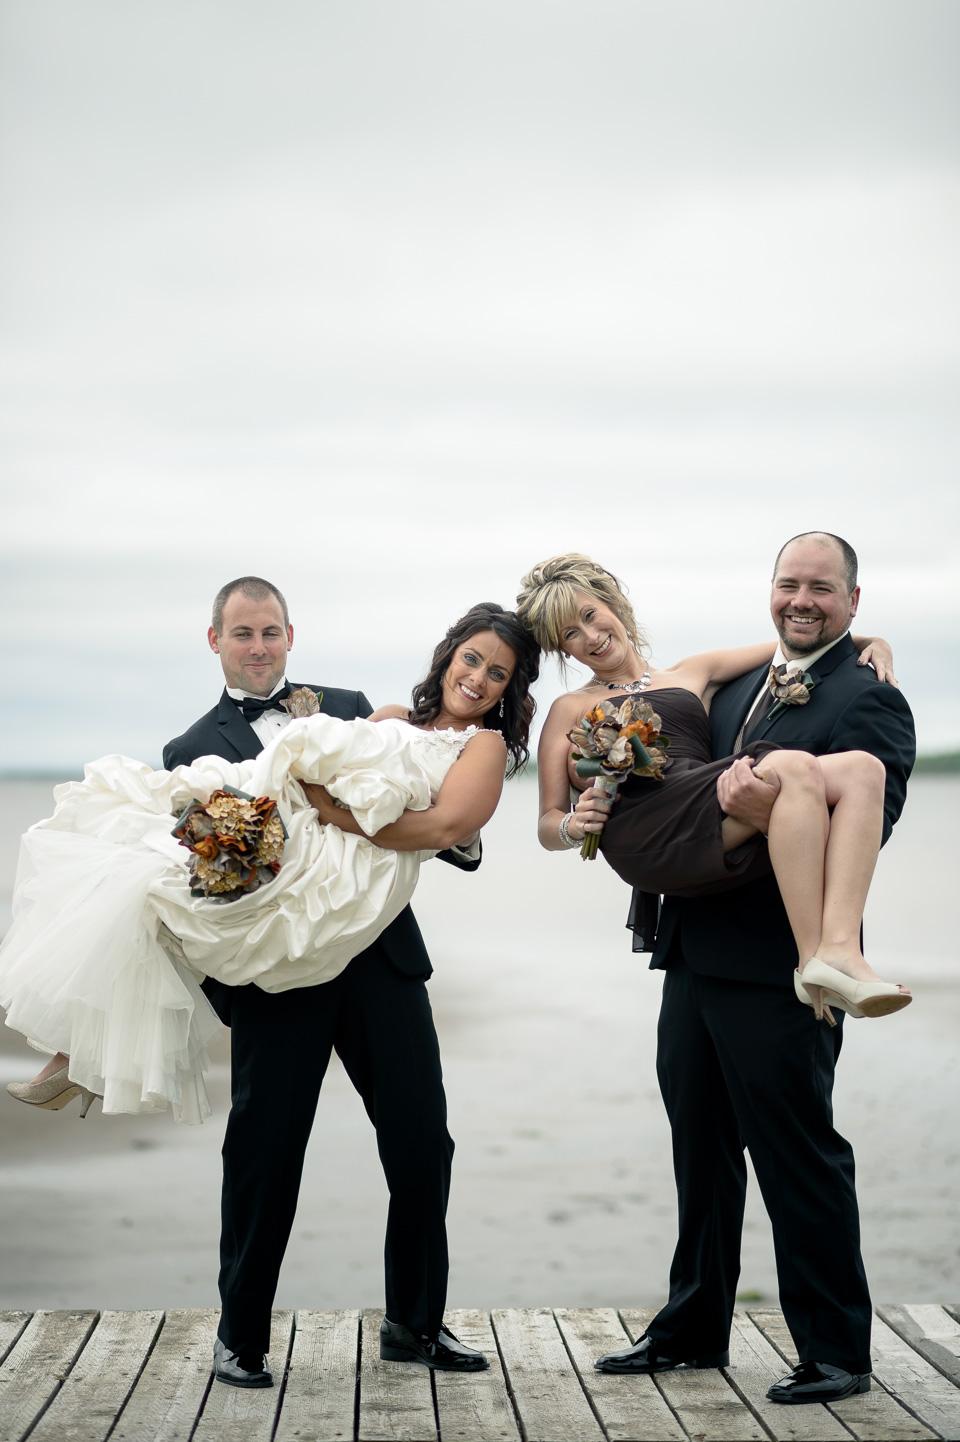 NIgel Fearon Photography | The LeBlanc Wedding-51.jpg